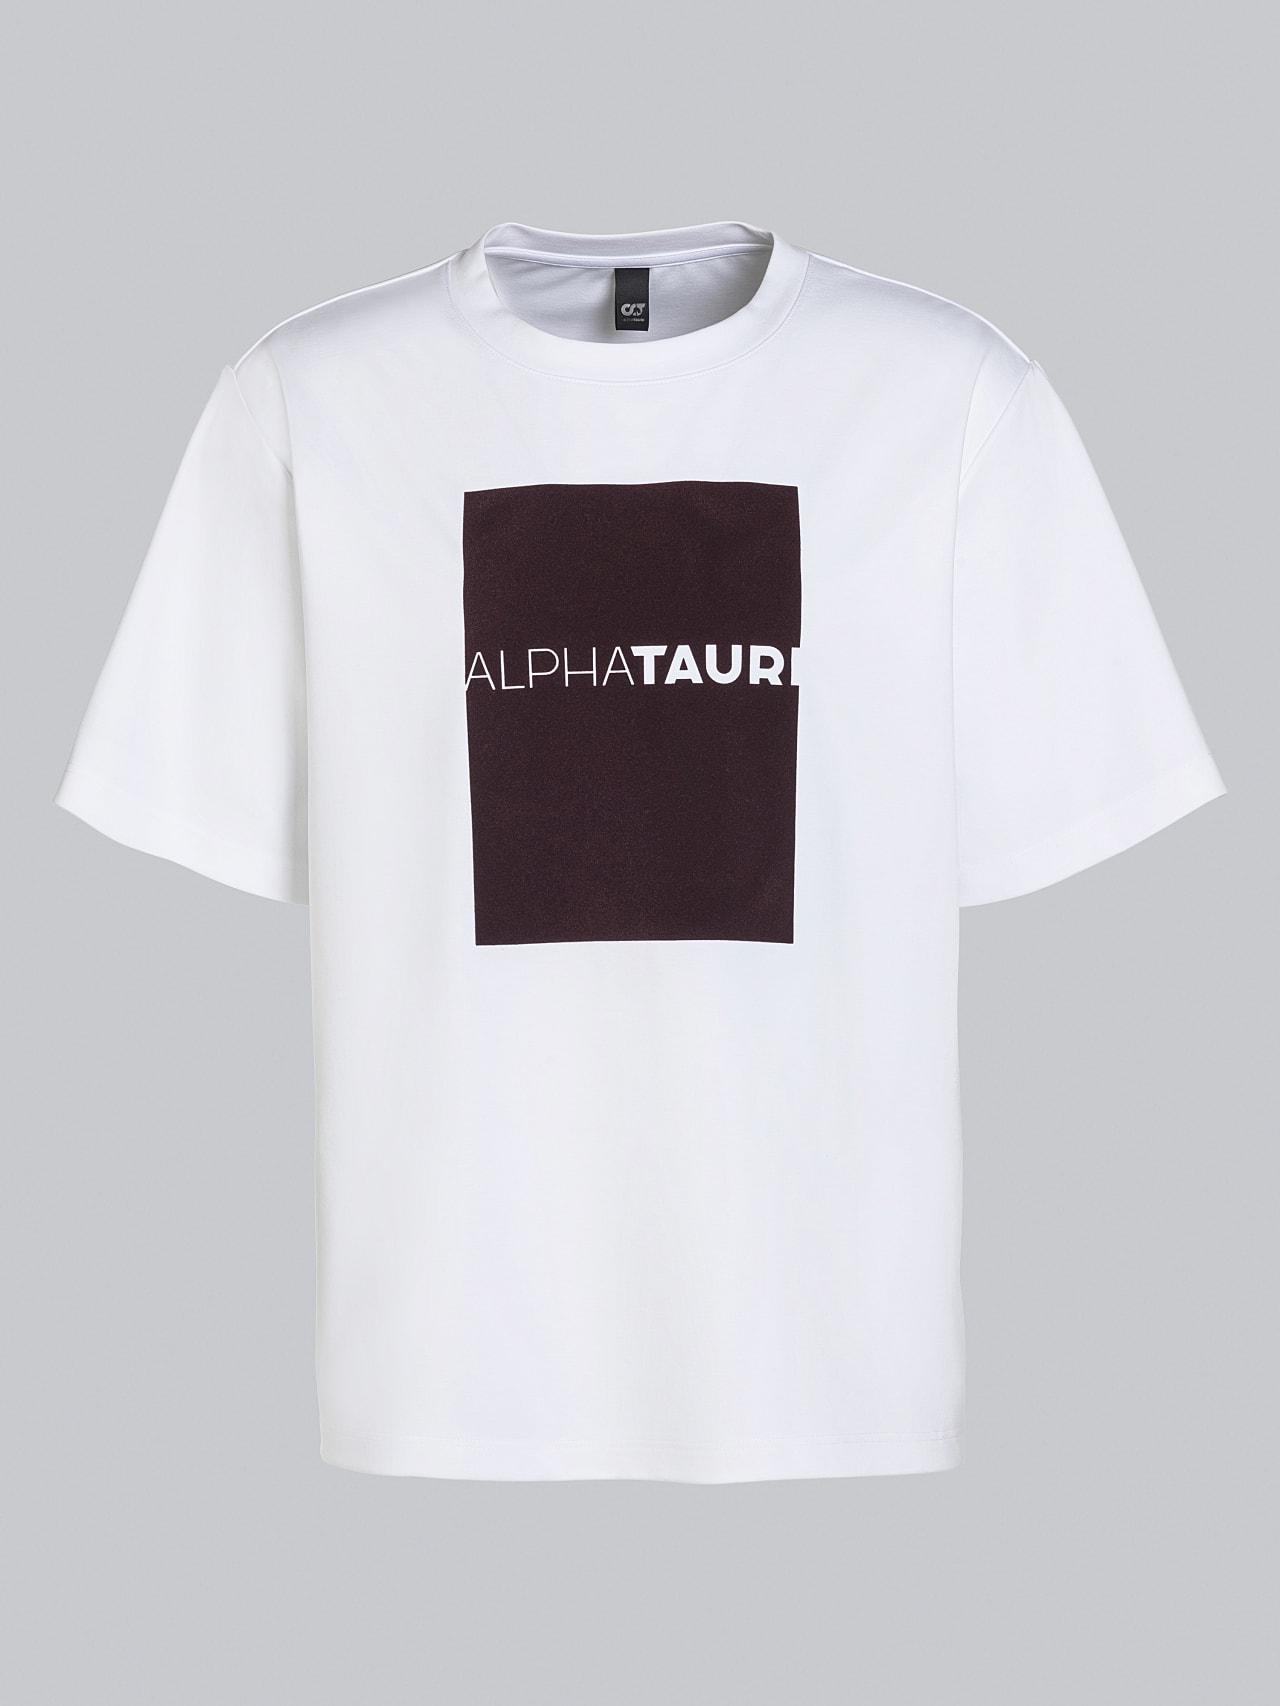 JAHEV V1.Y5.02 Relaxed Logo T-Shirt white Back Alpha Tauri